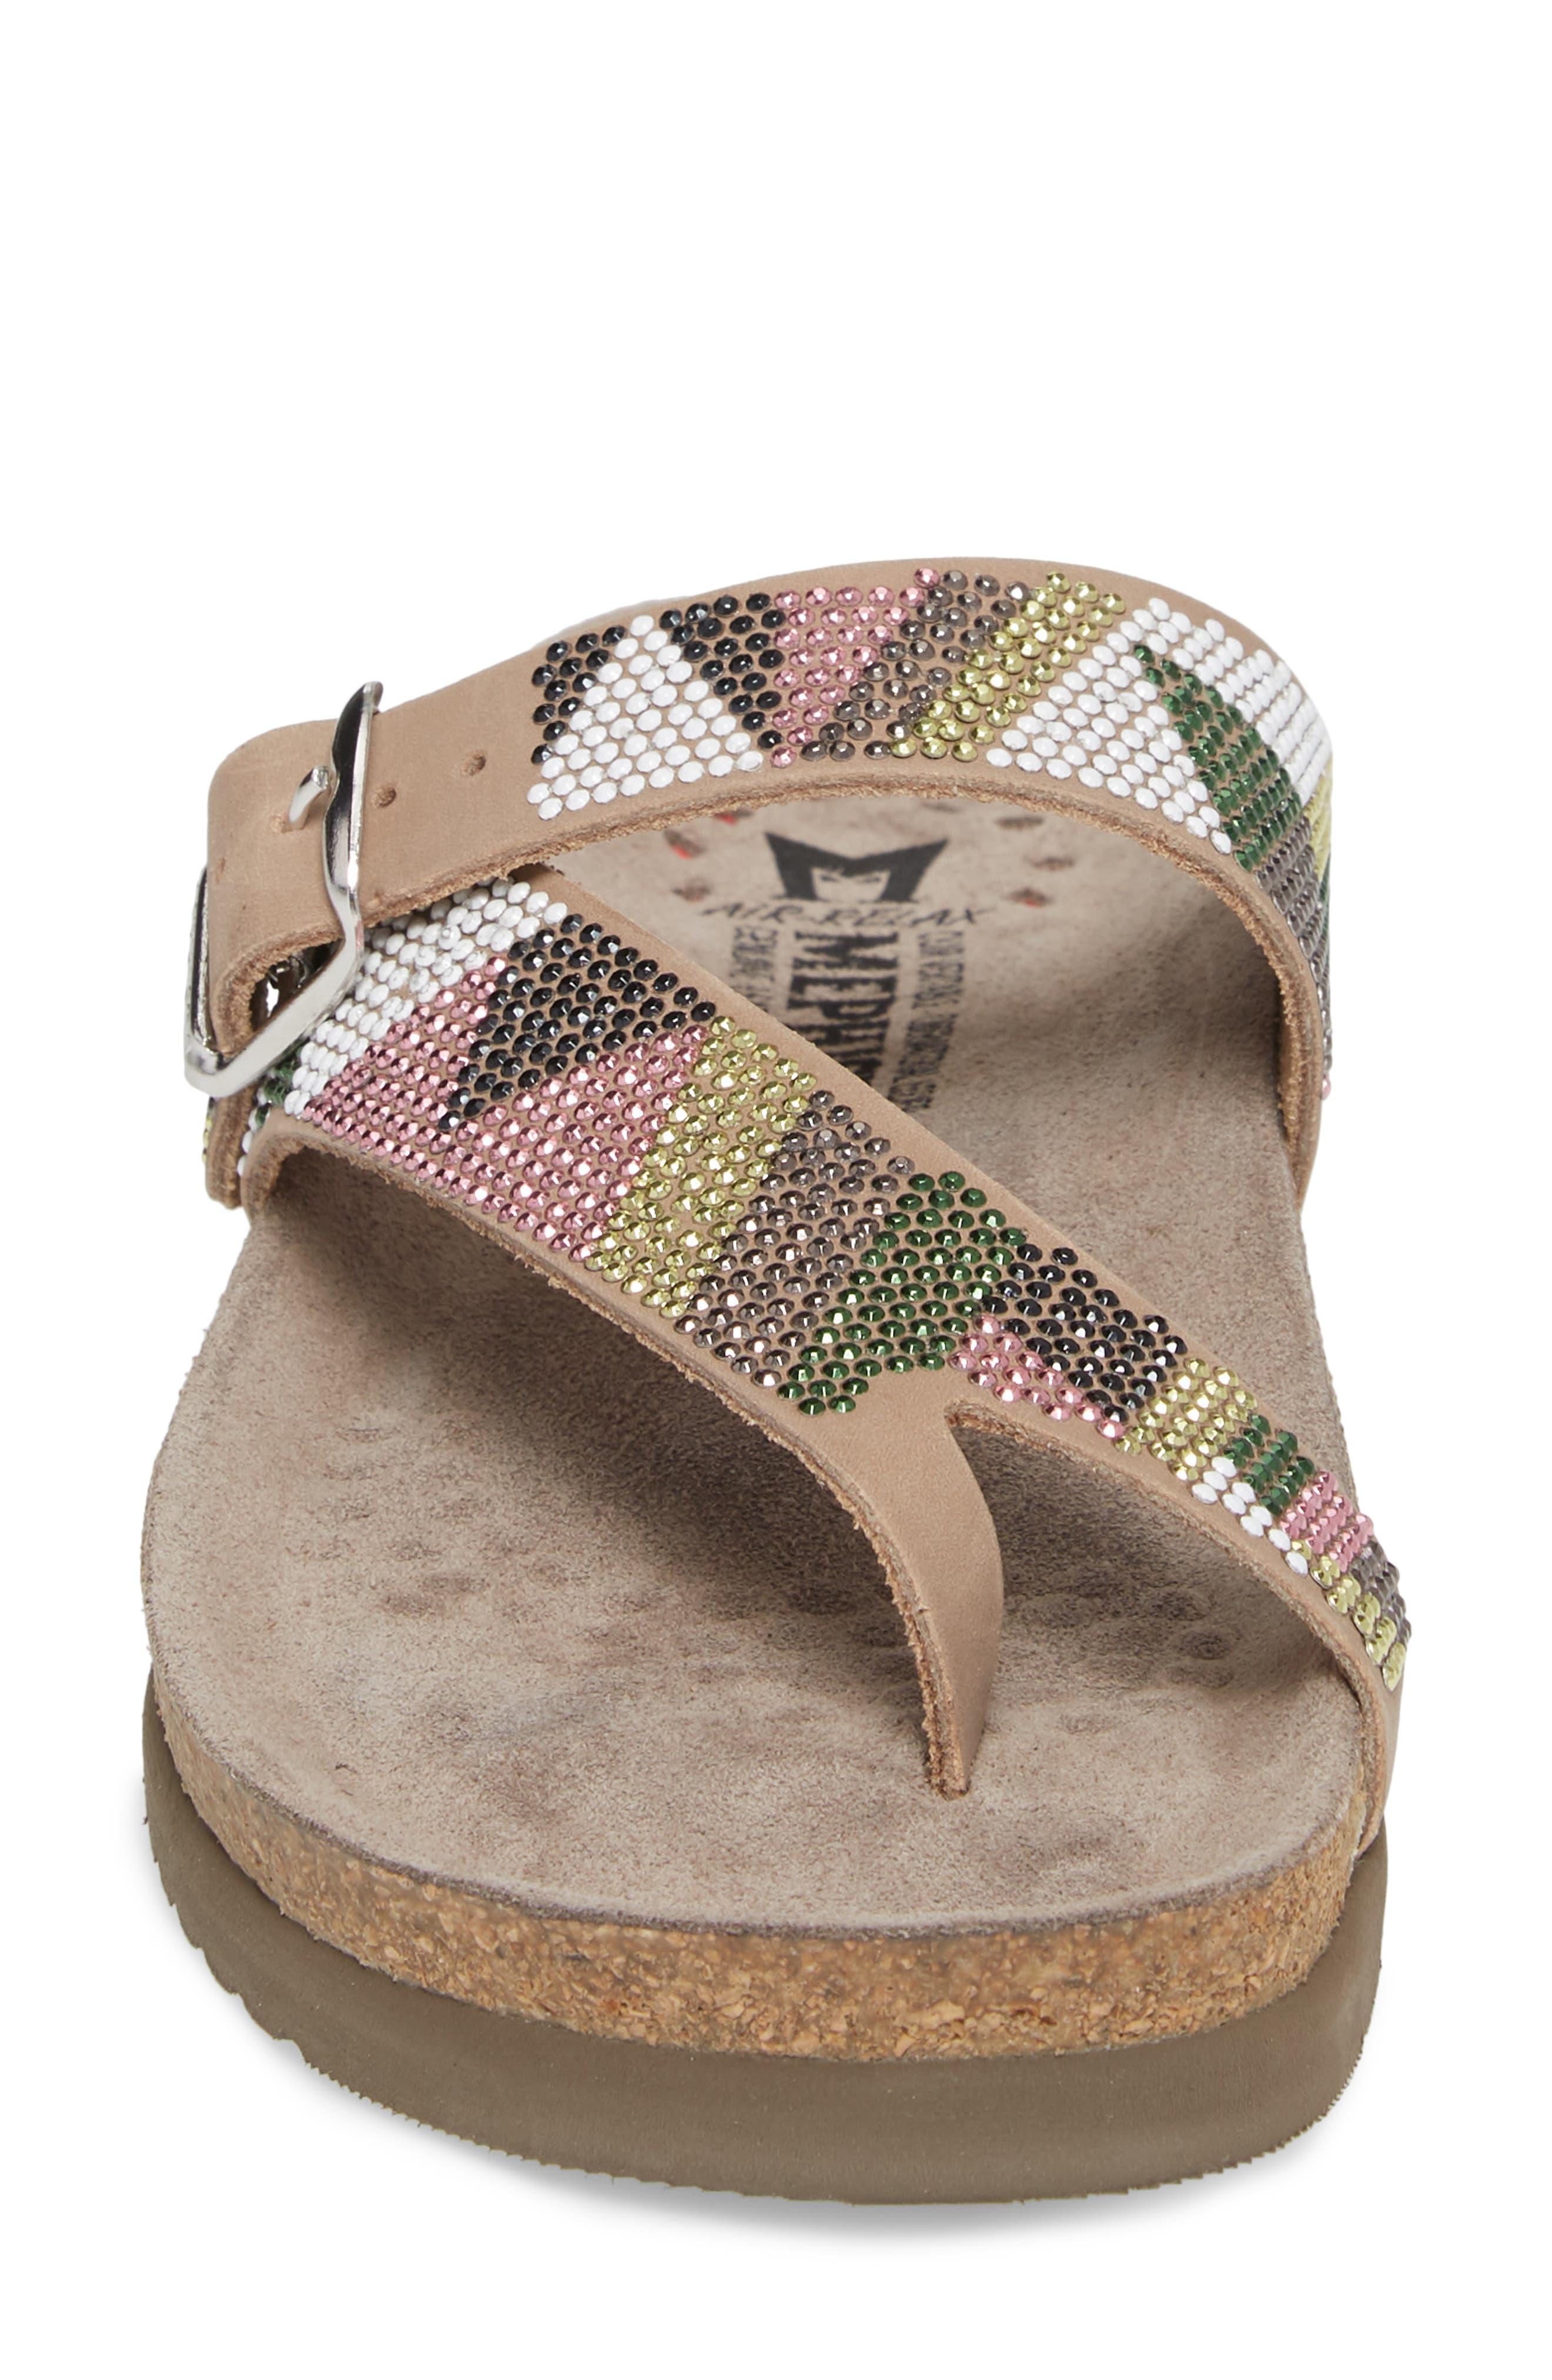 Helen Slide Sandal,                             Alternate thumbnail 4, color,                             Taupe/ Green/ Pink